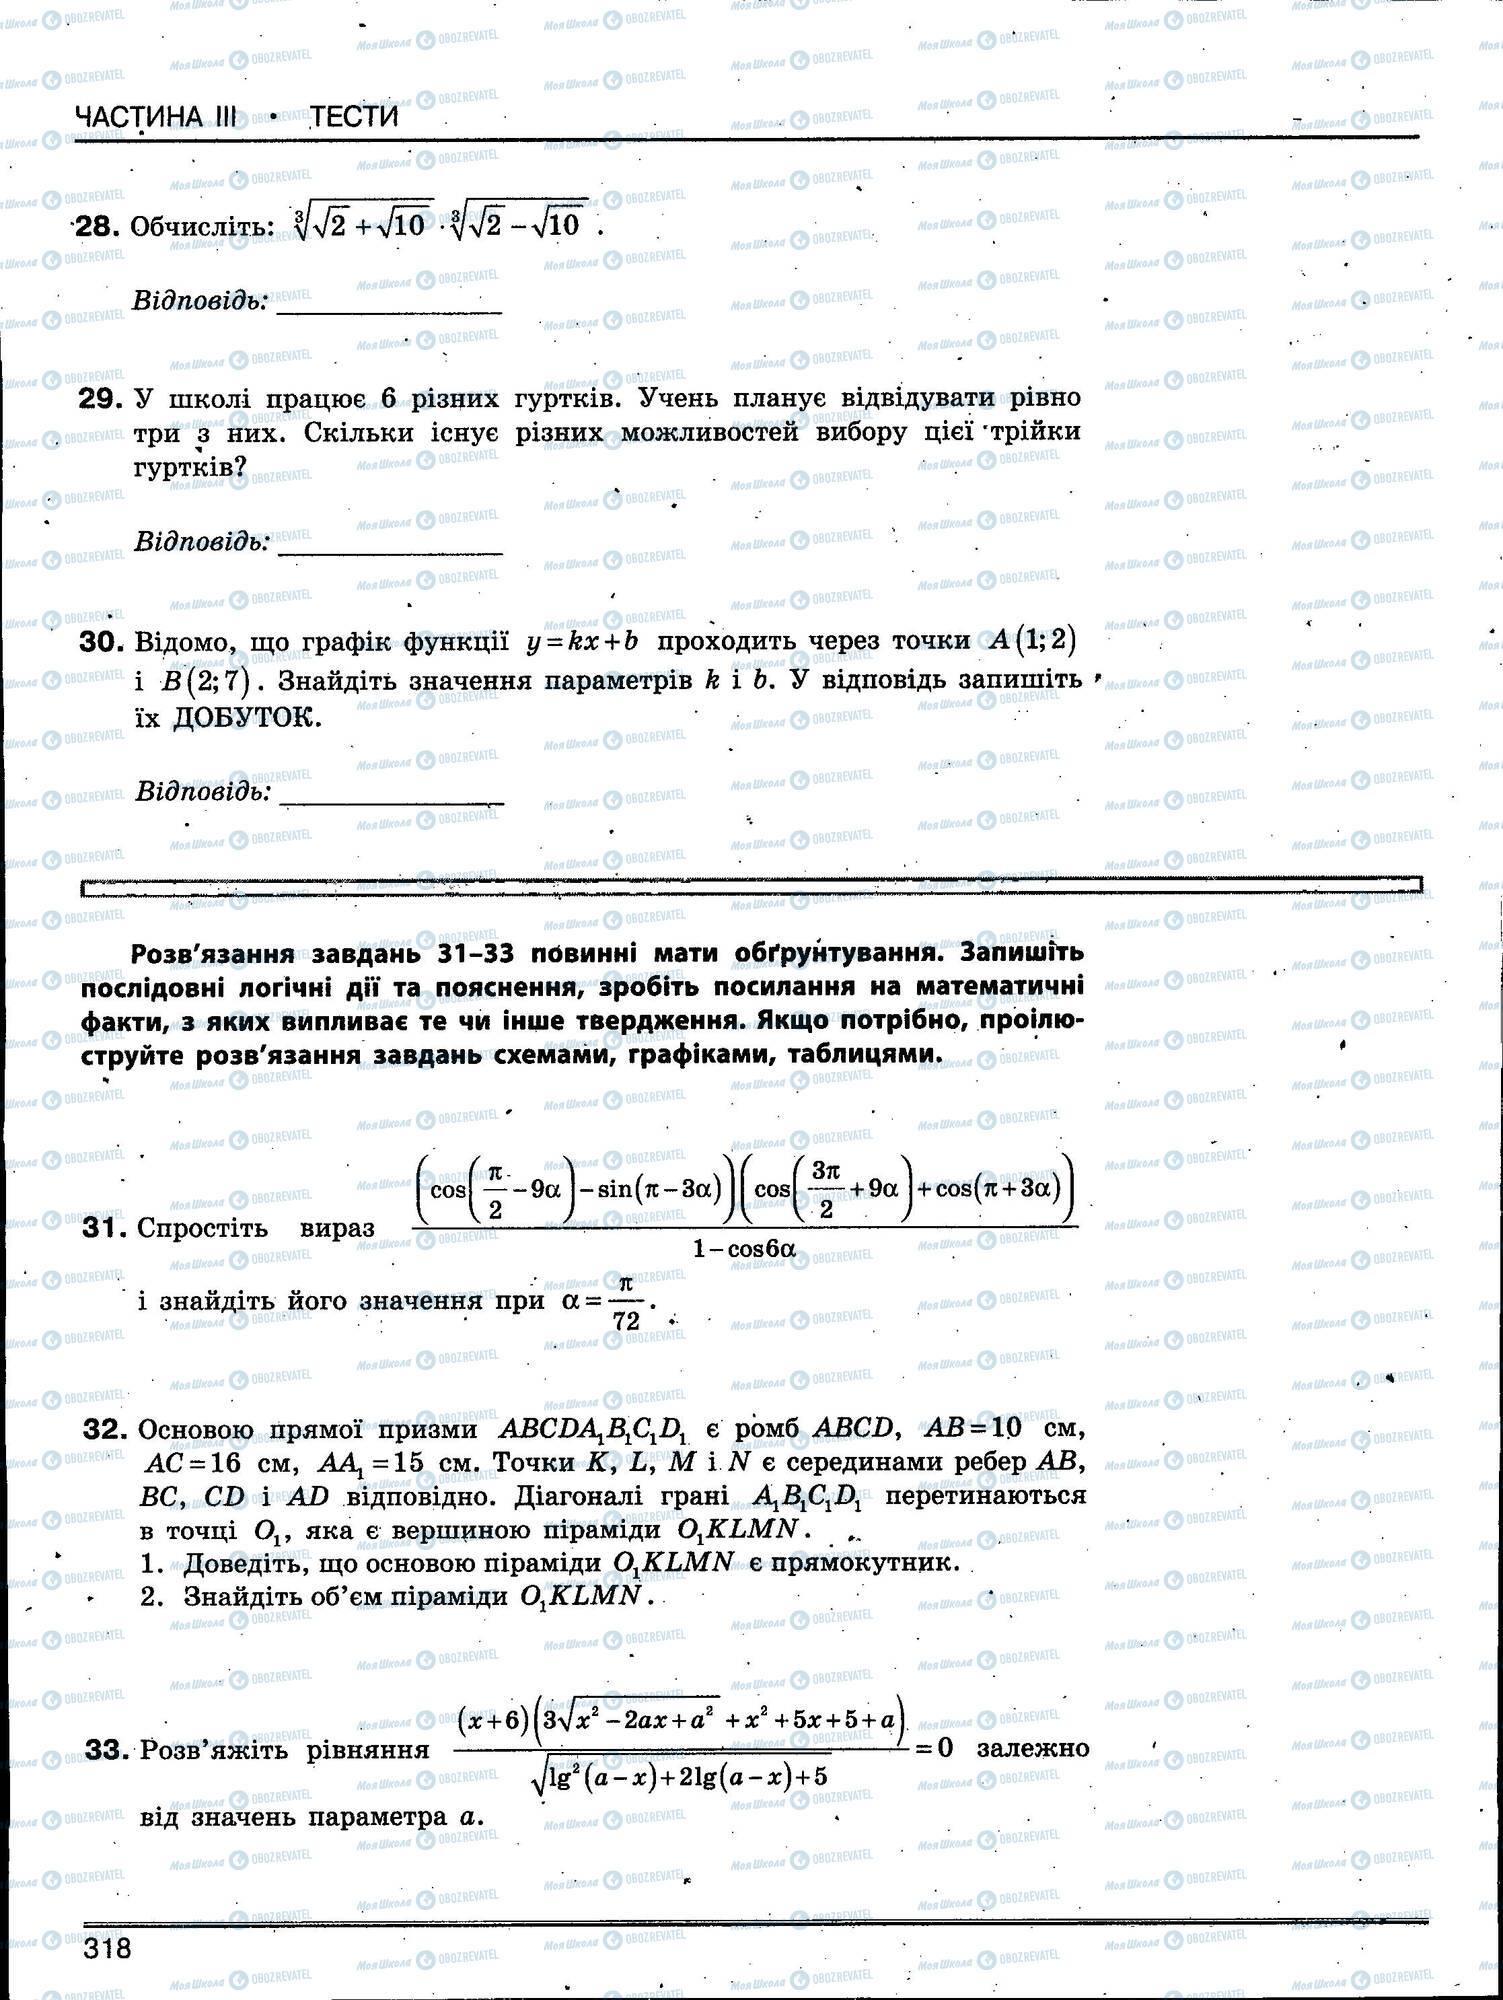 ЗНО Математика 11 класс страница 318